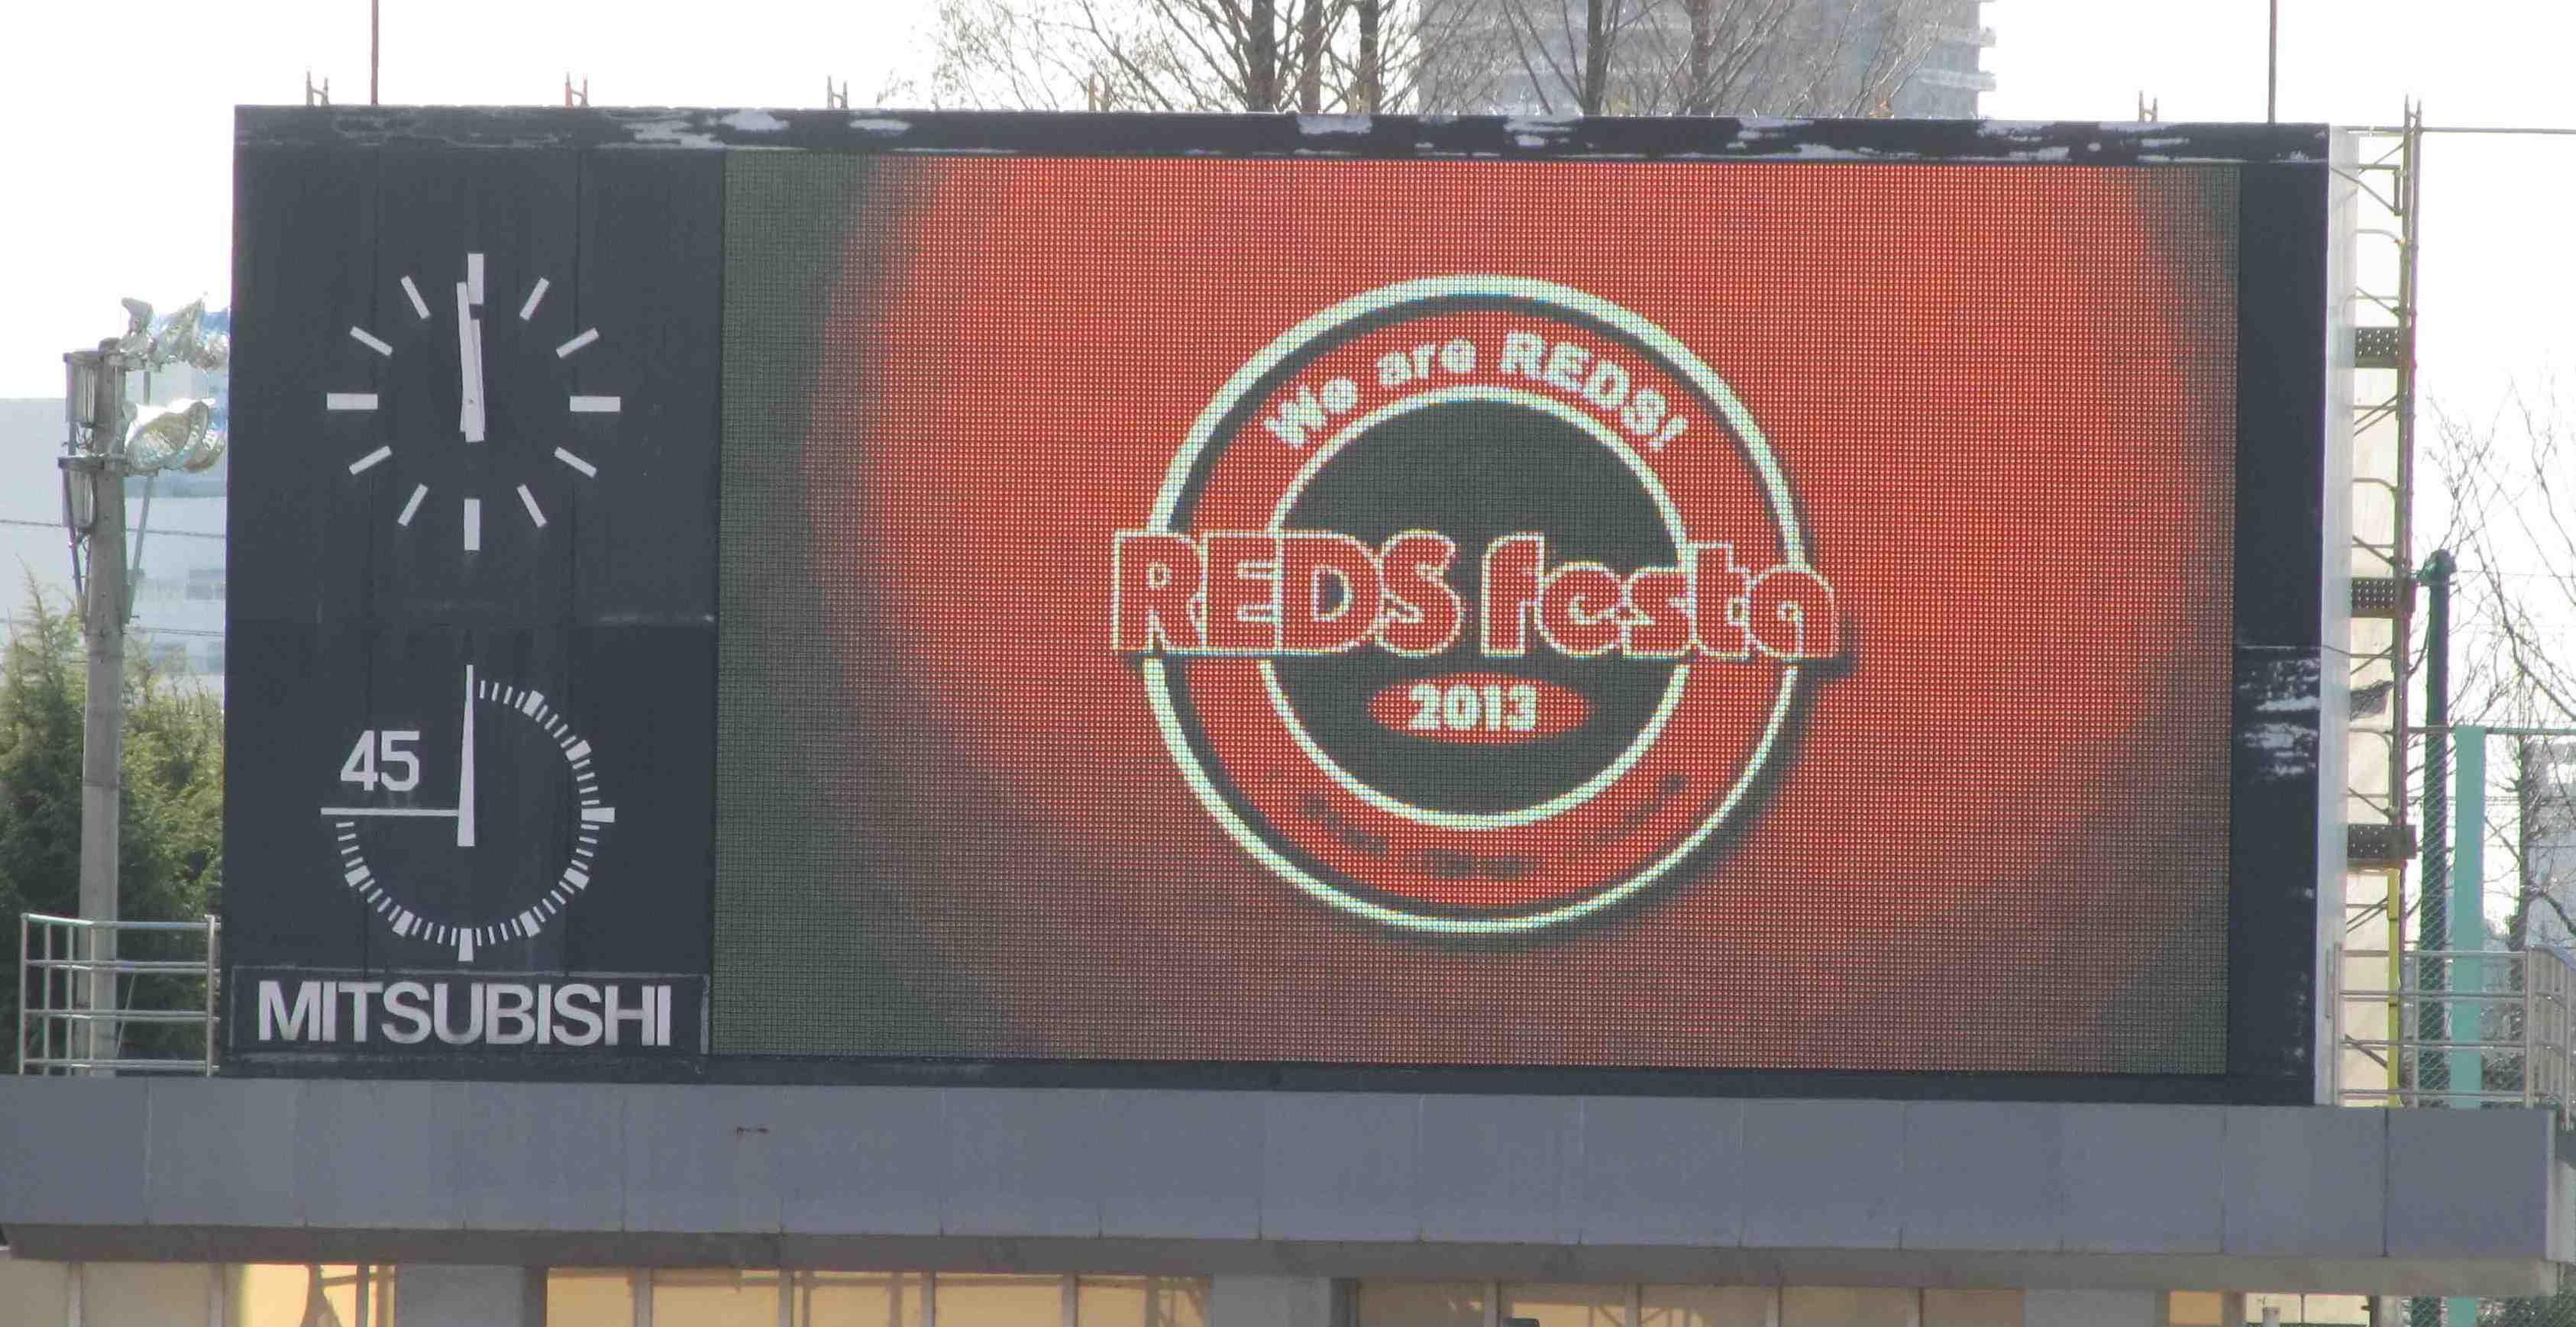 REDSfesta2013-01.jpg